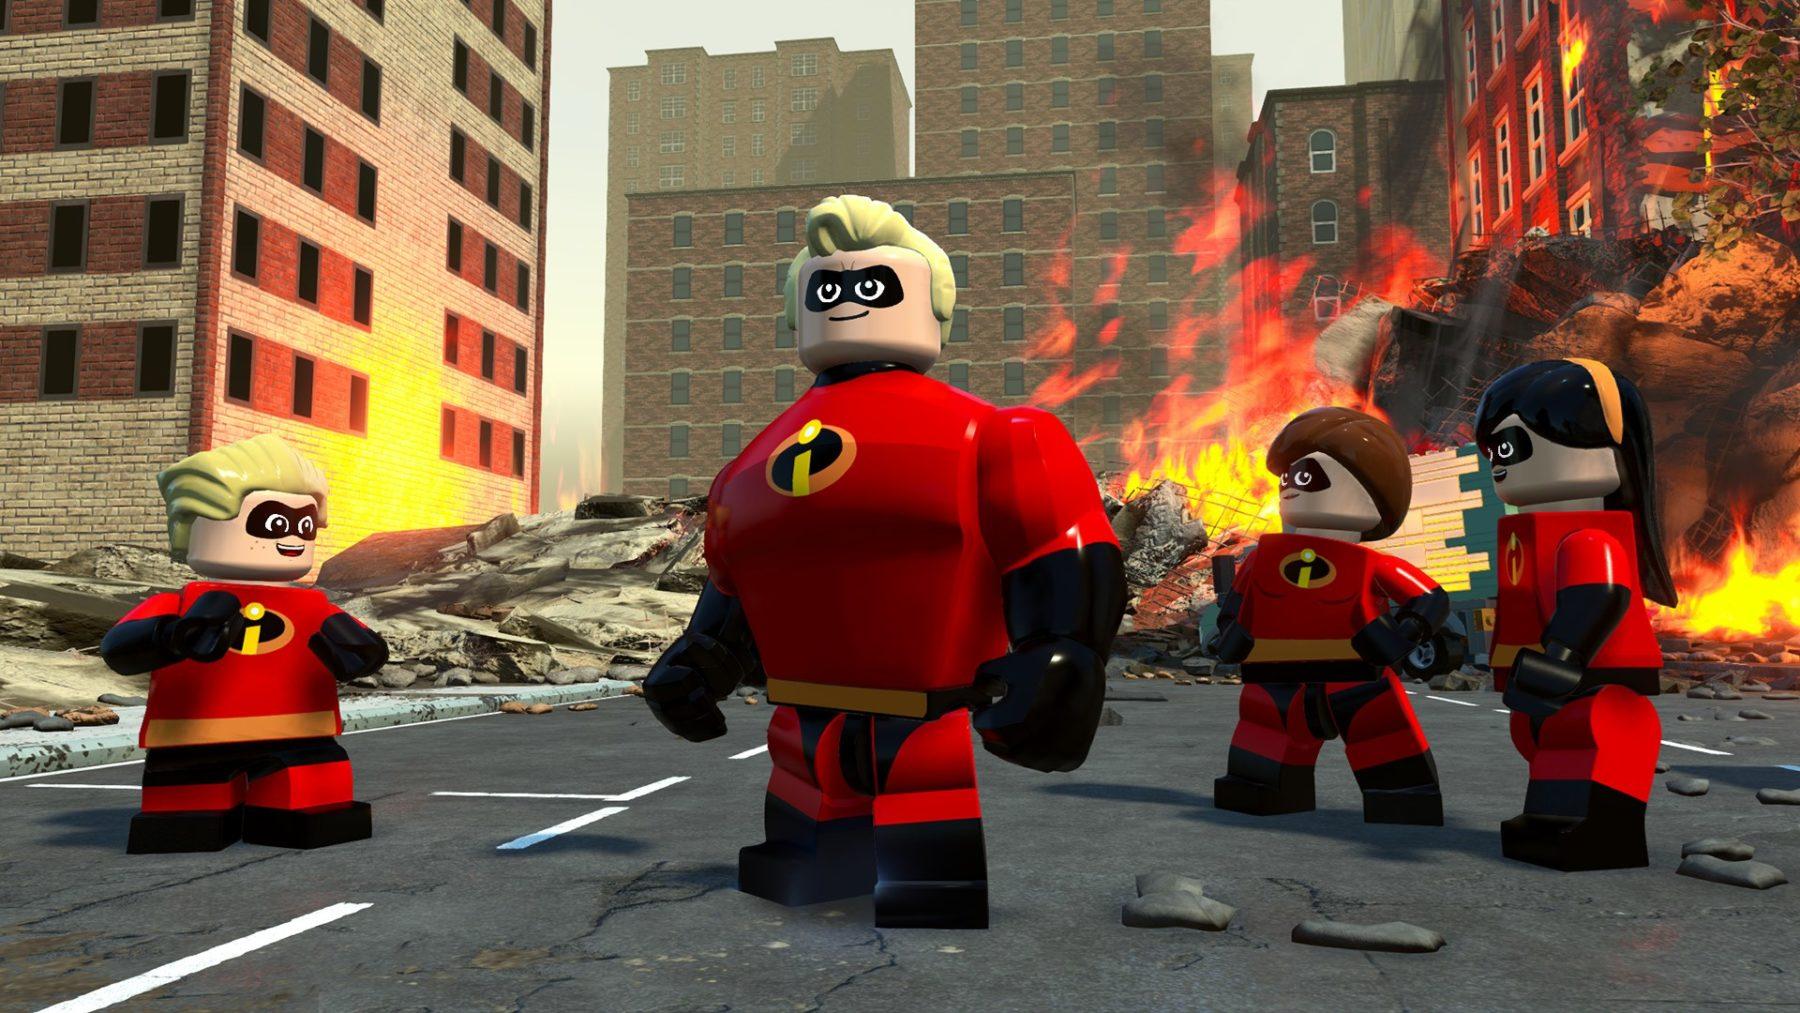 Warner Bros. Interactive Entertainment anuncia que LEGO: The Incredibles llegará este julio